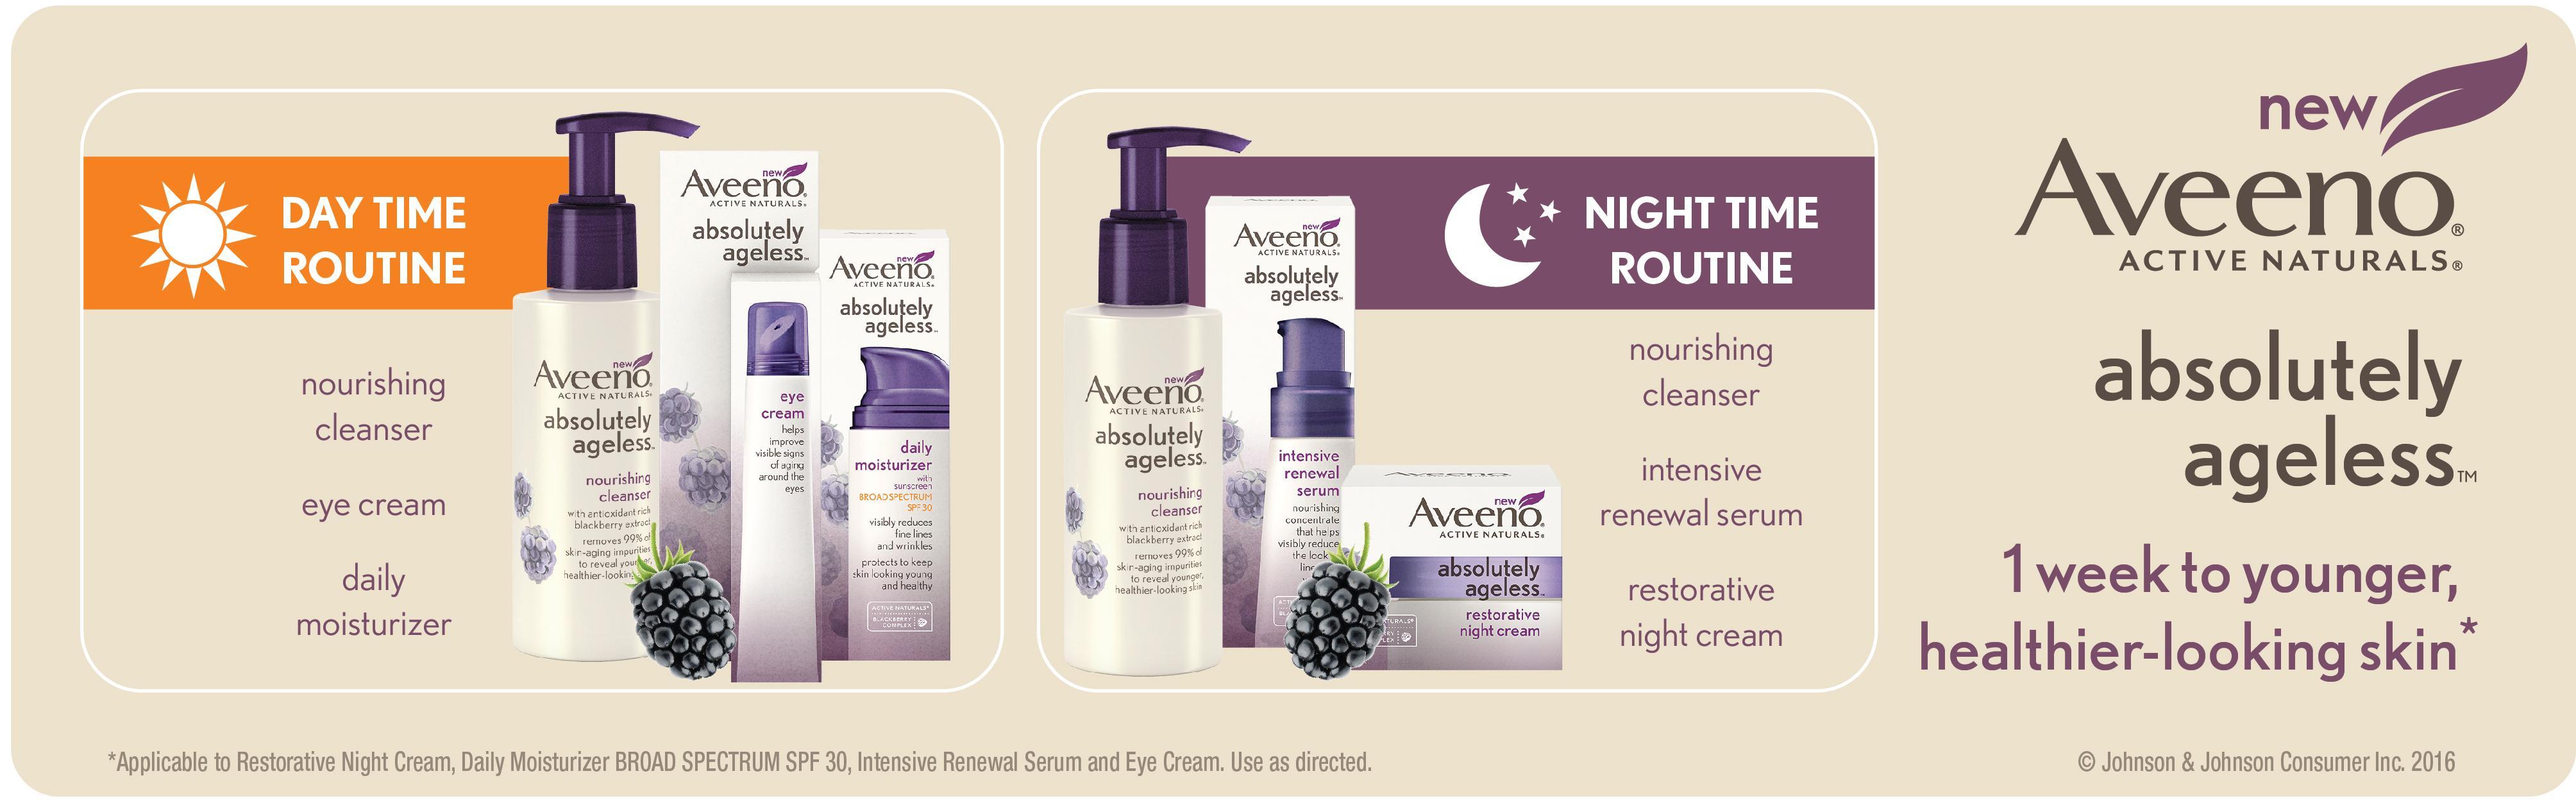 Aveeno day time routine, night time routine, AVEENO Absolutely Ageless